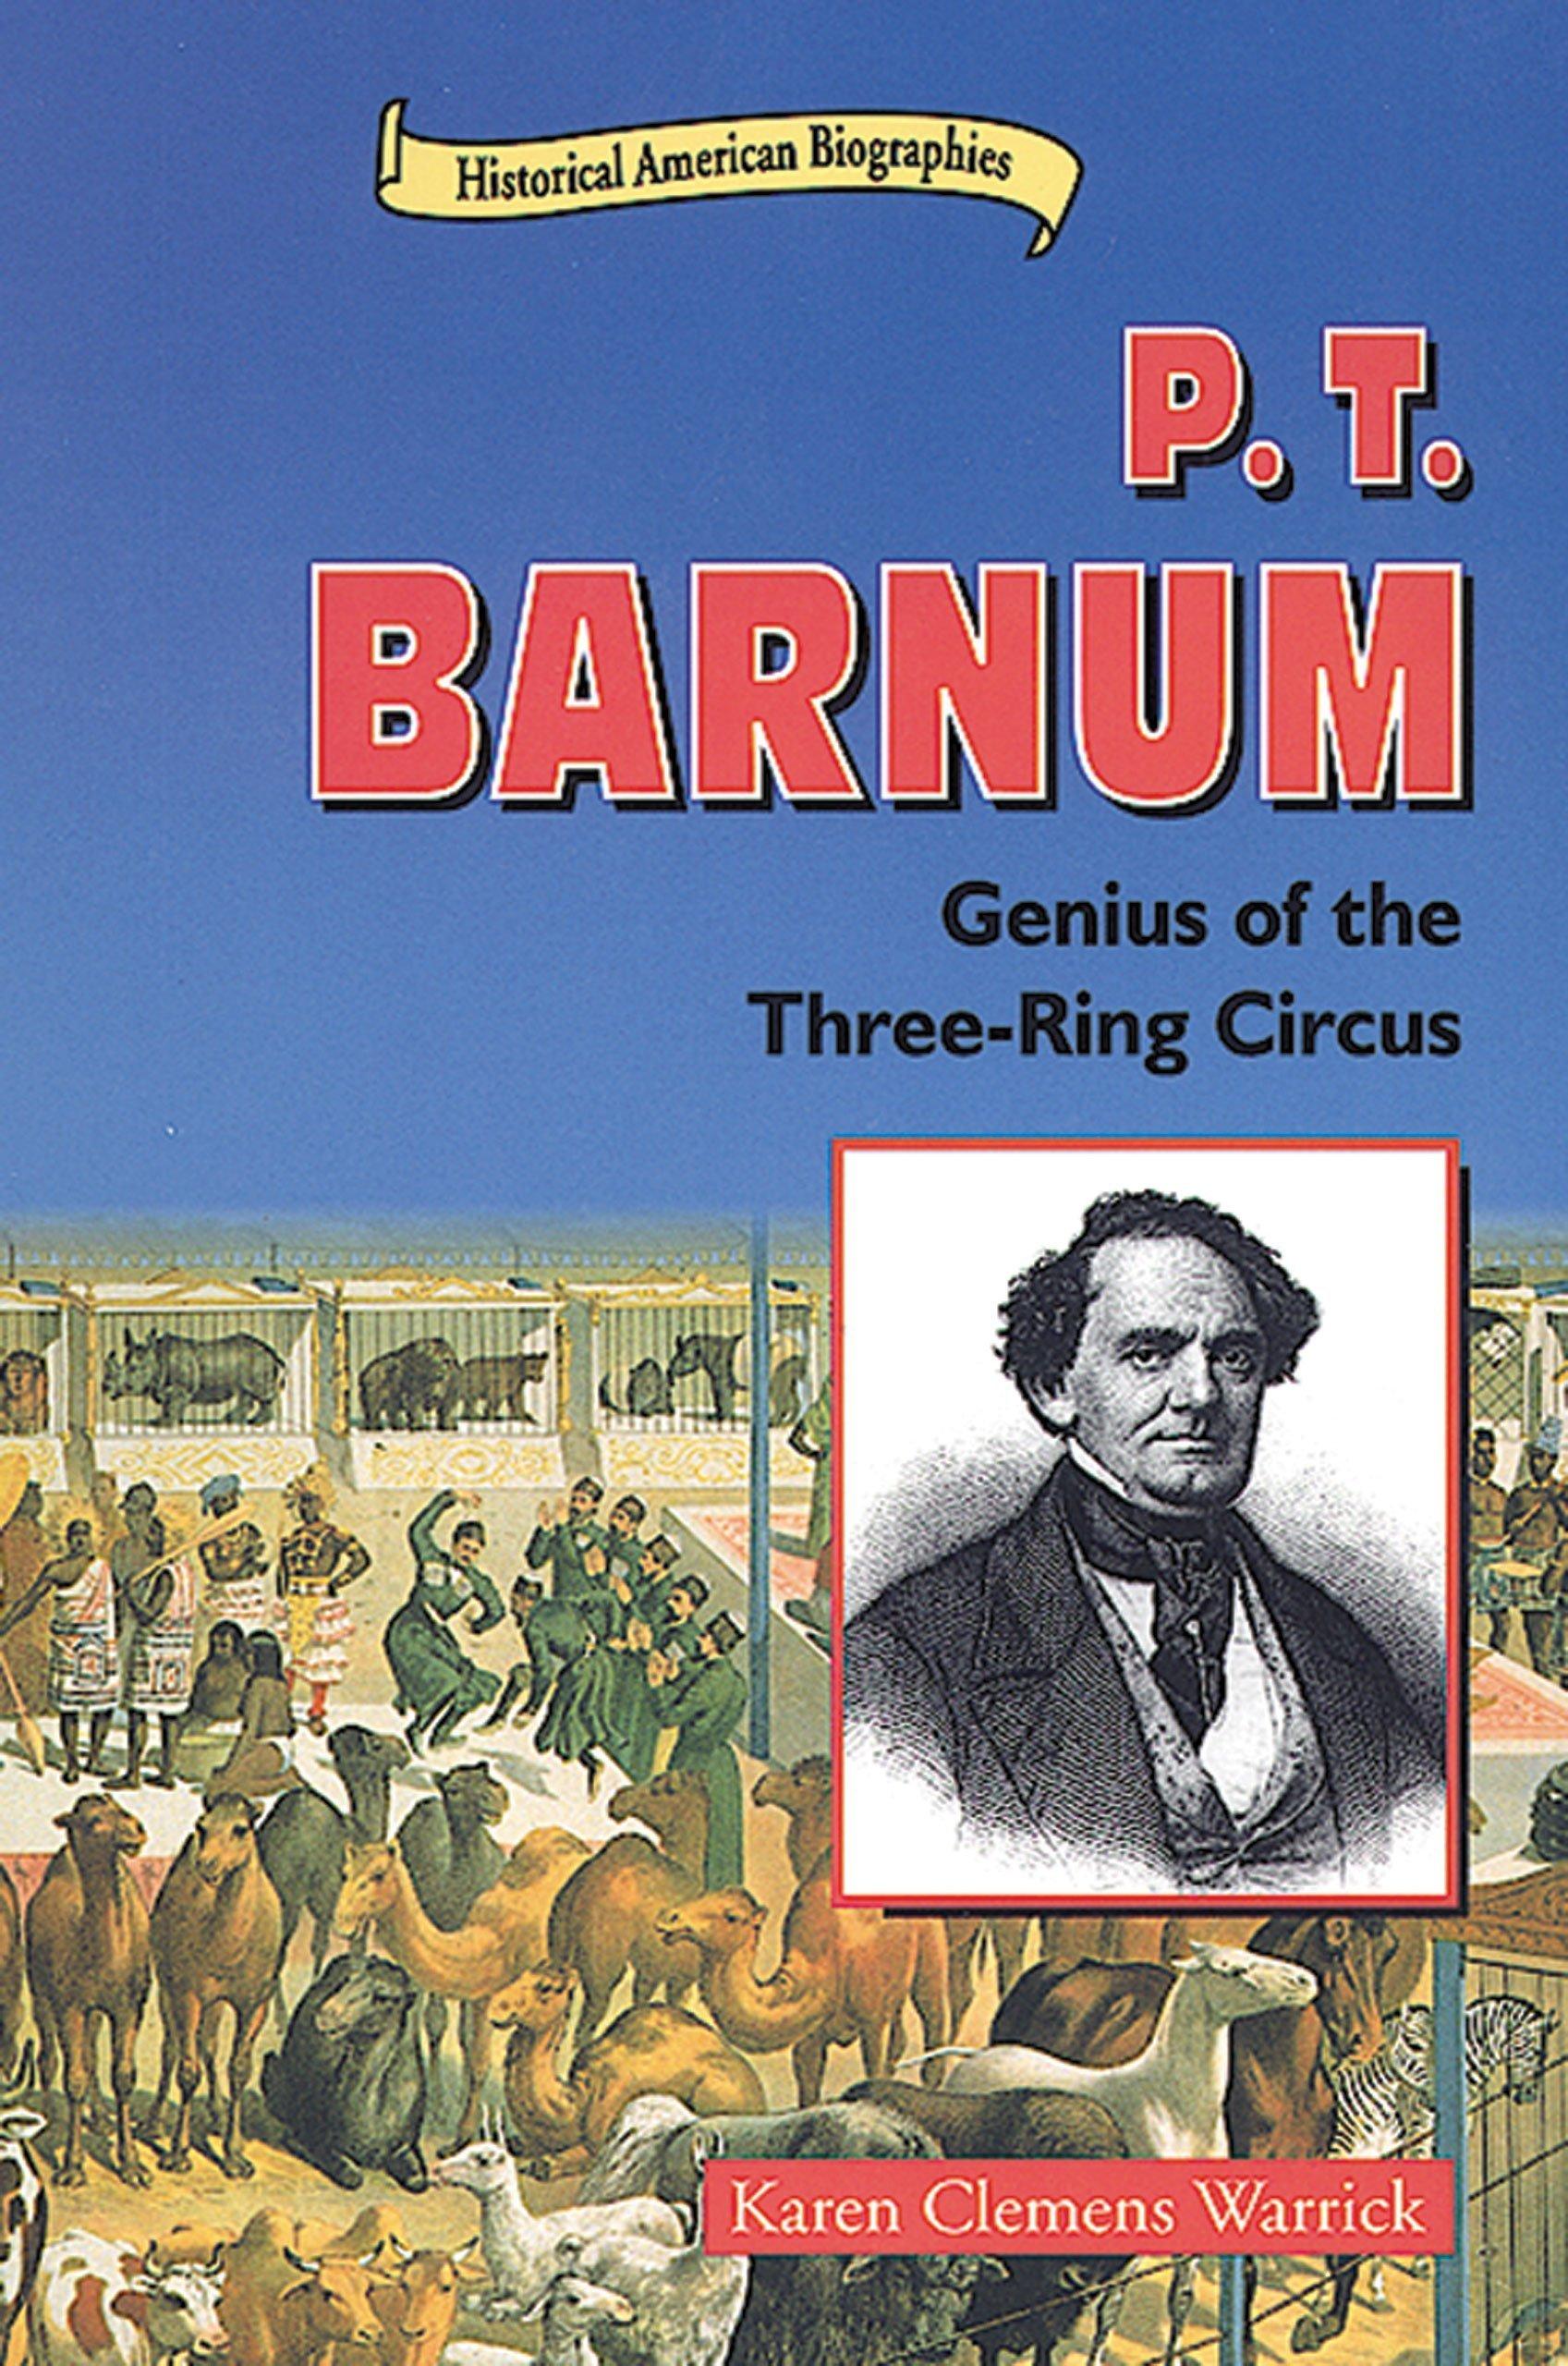 Download P.T. Barnum: Genius of the Three-Ring Circus (Historical American Biographies) PDF